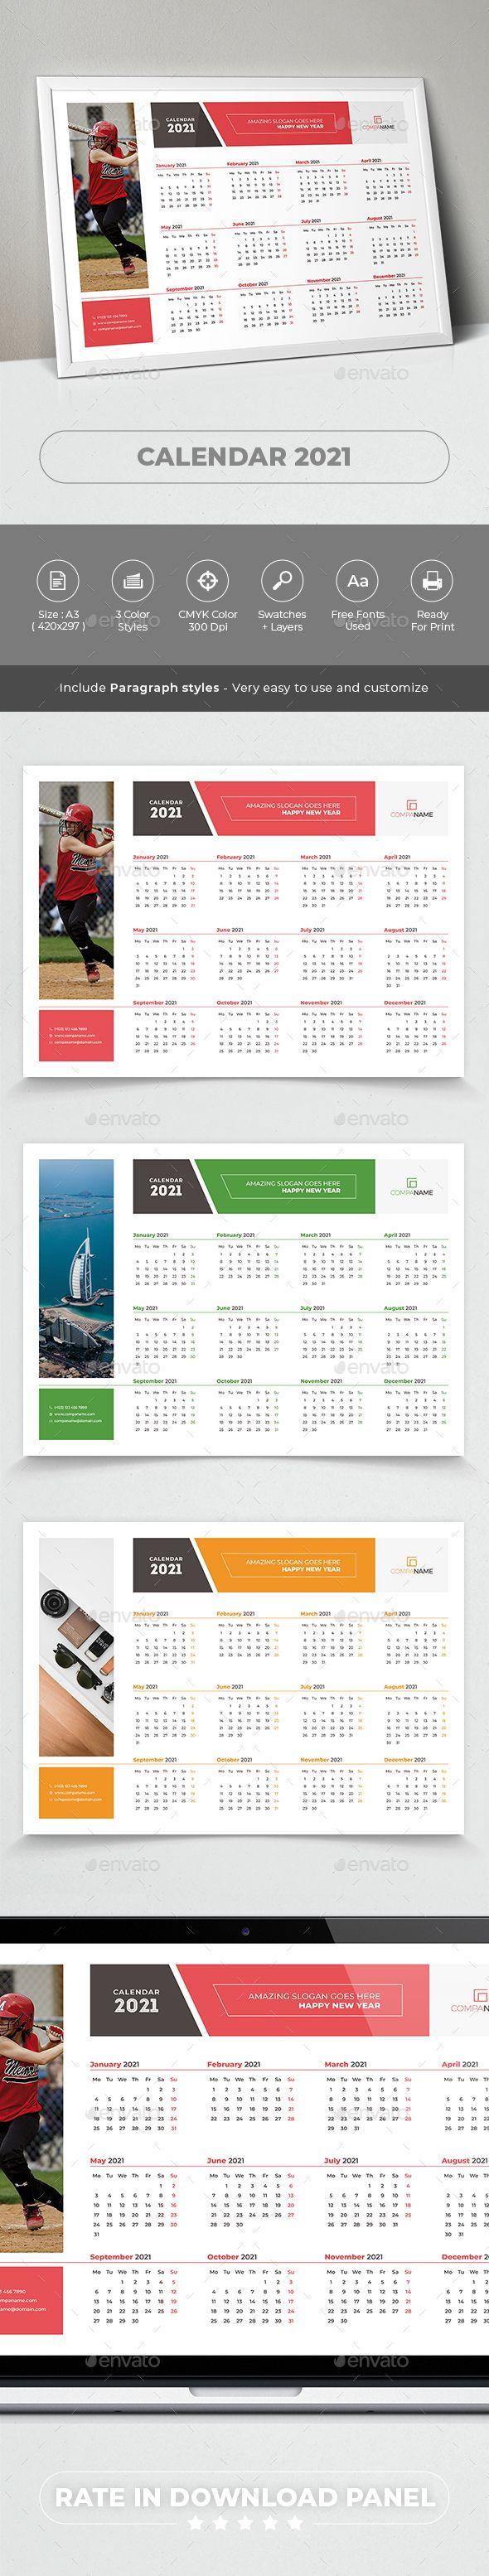 calendar 2021 in 2020 calendar template calendar 2019 on office wall colors 2021 id=46294